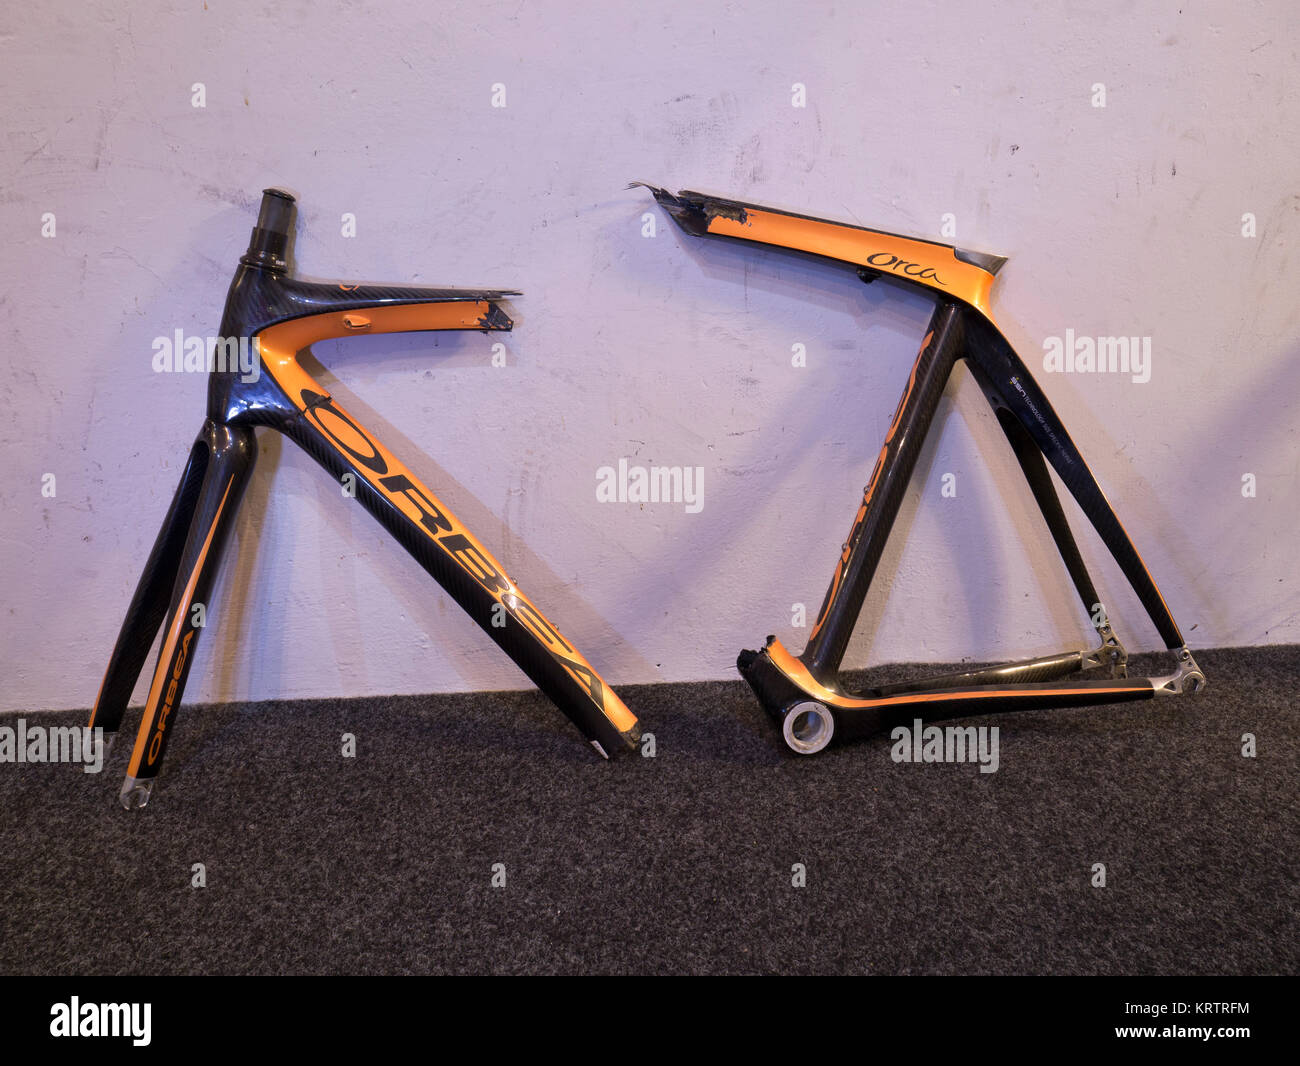 Broken carbon fibre bike frame Stock Photo: 169575720 - Alamy